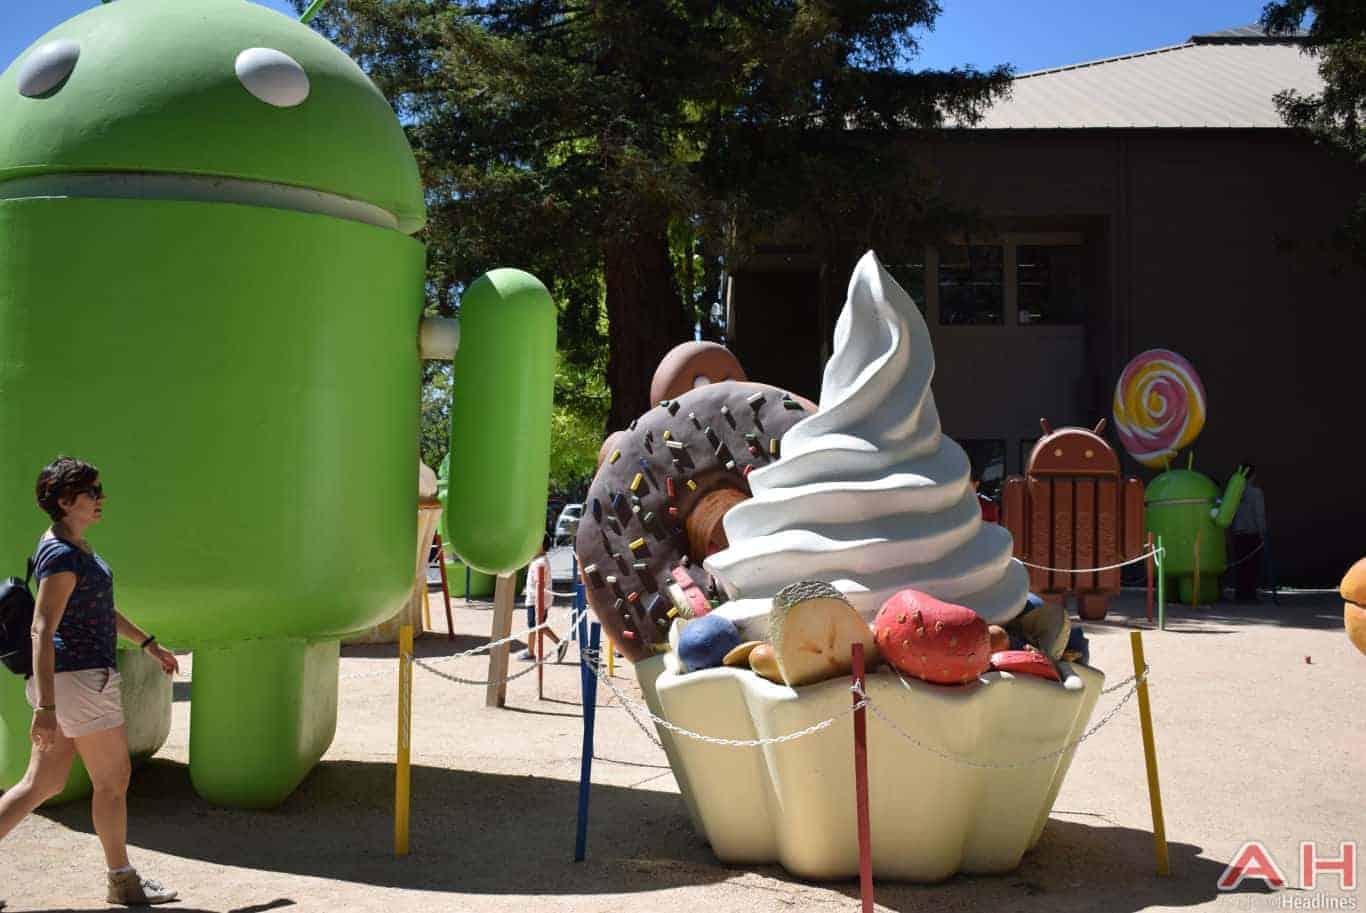 Googleplex Android Statue Google AH 1